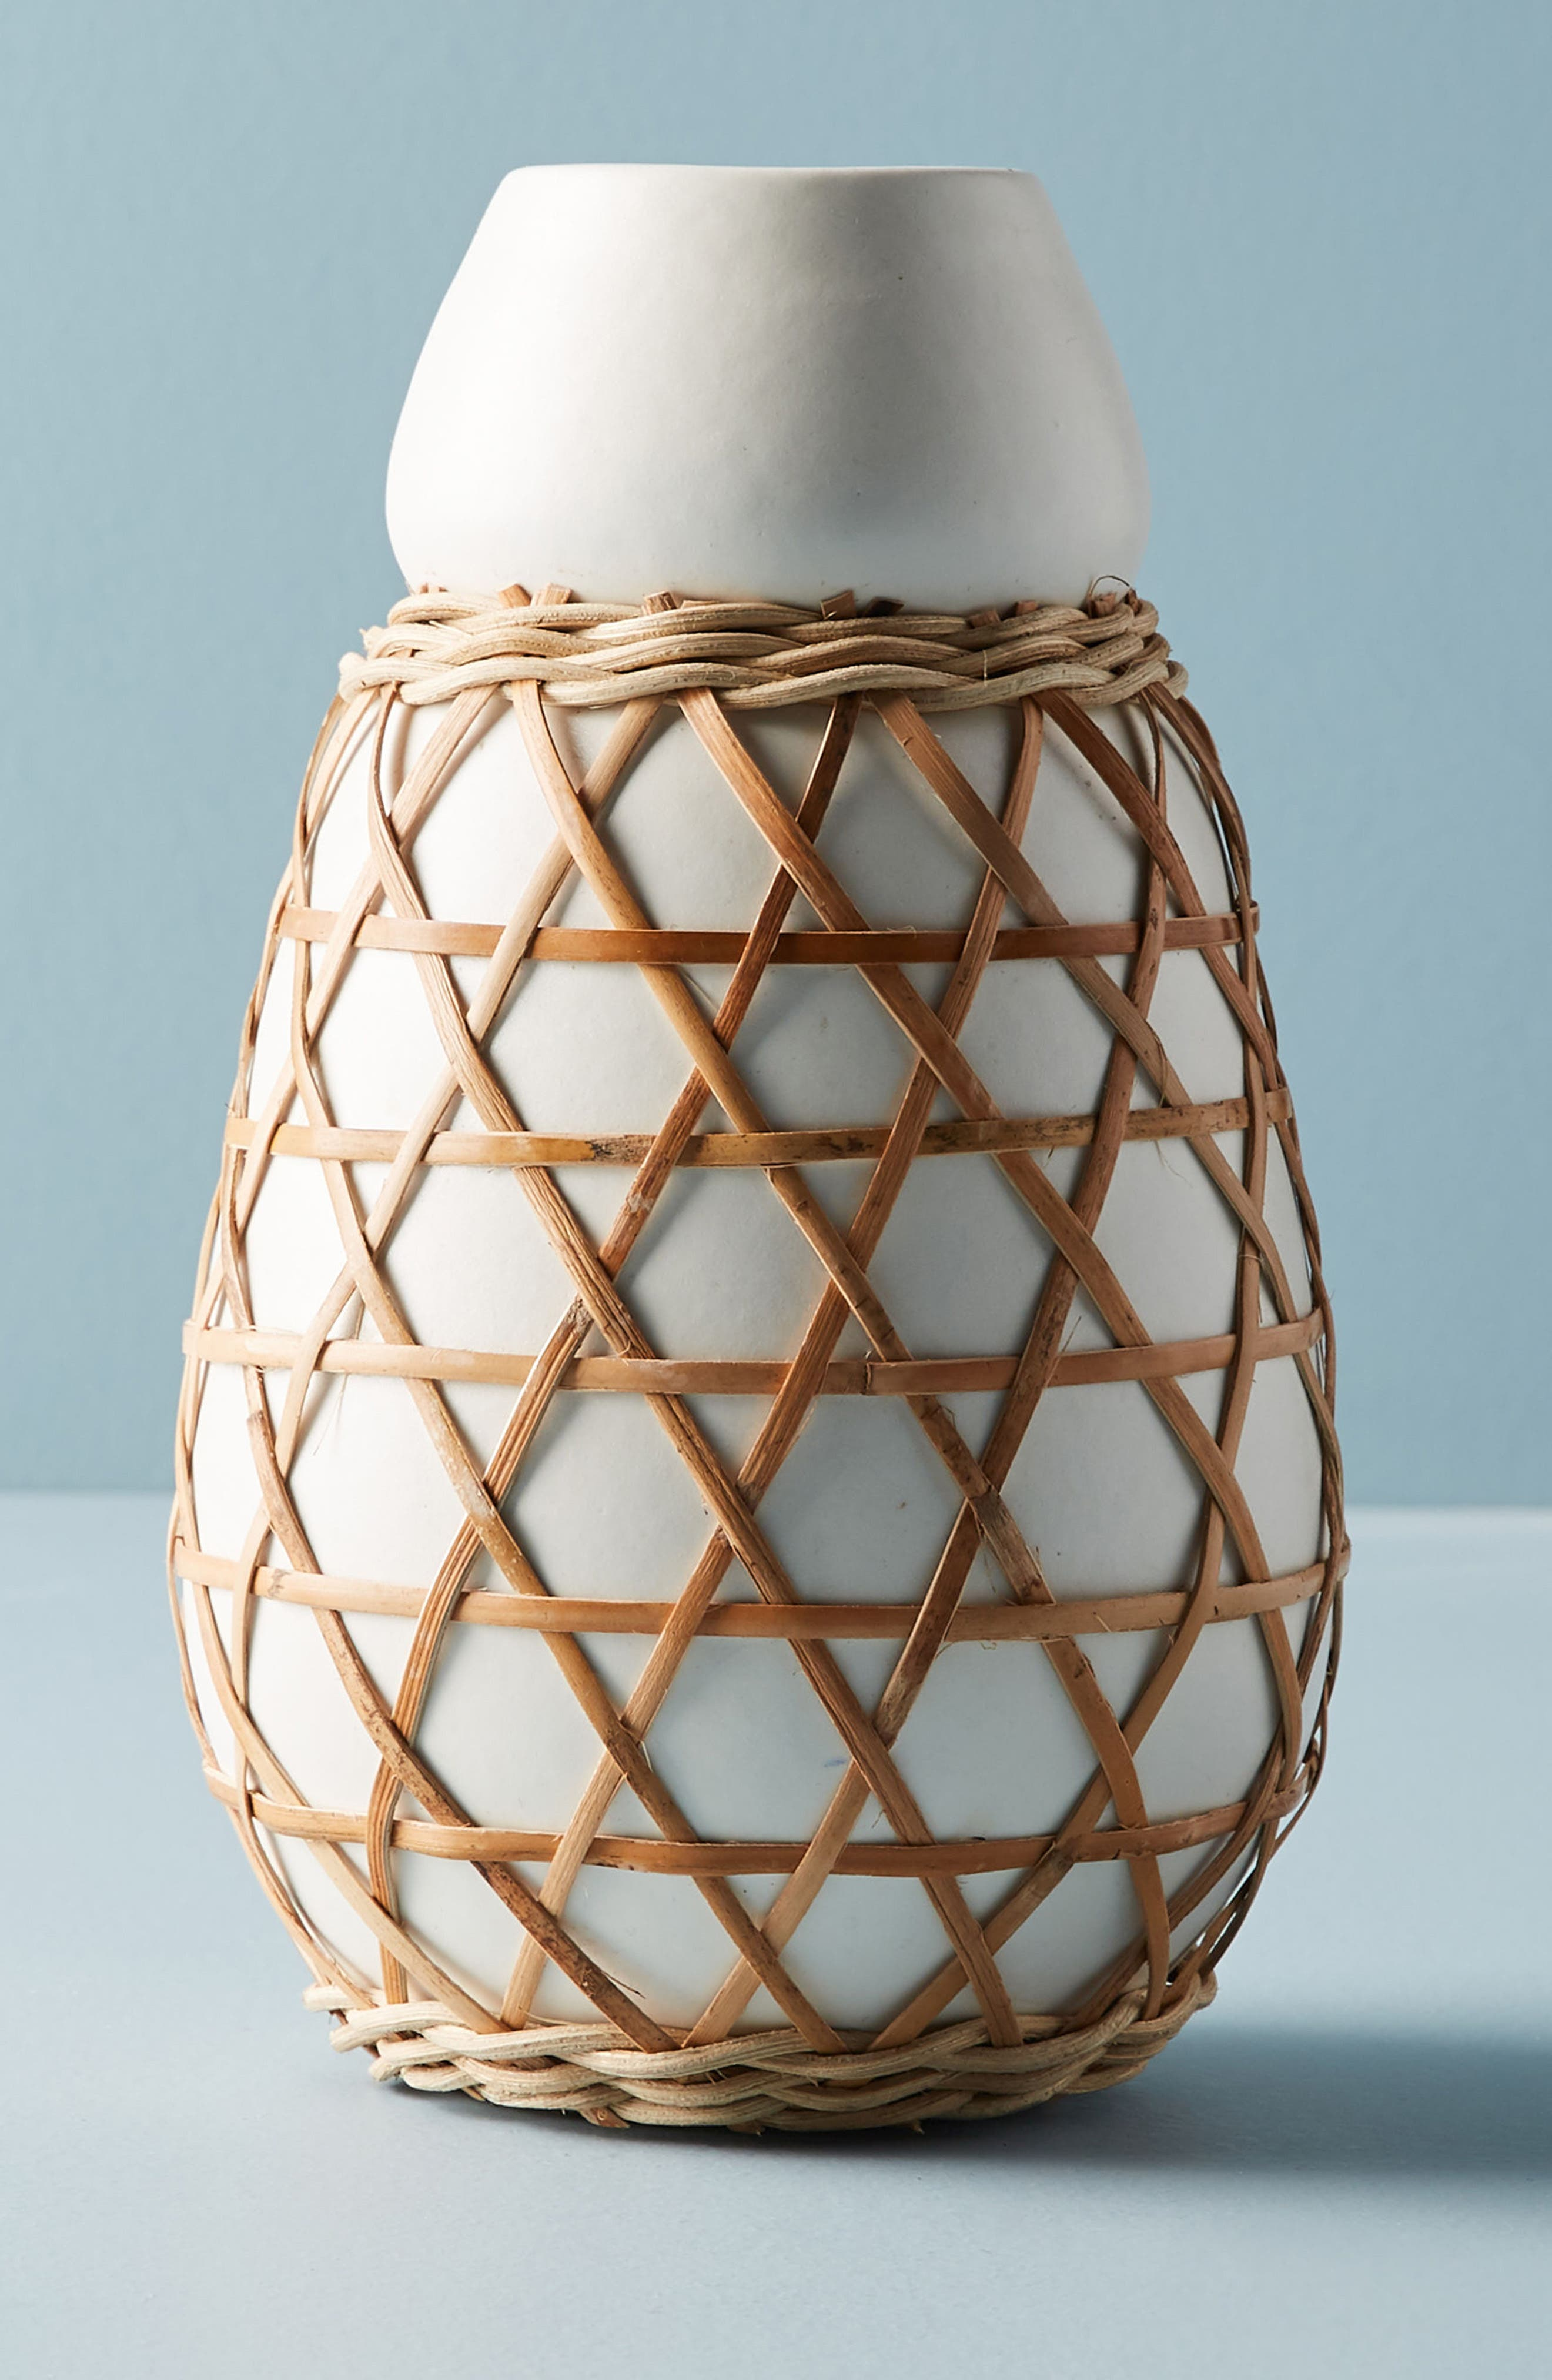 Woven Grass Vase,                             Main thumbnail 1, color,                             100